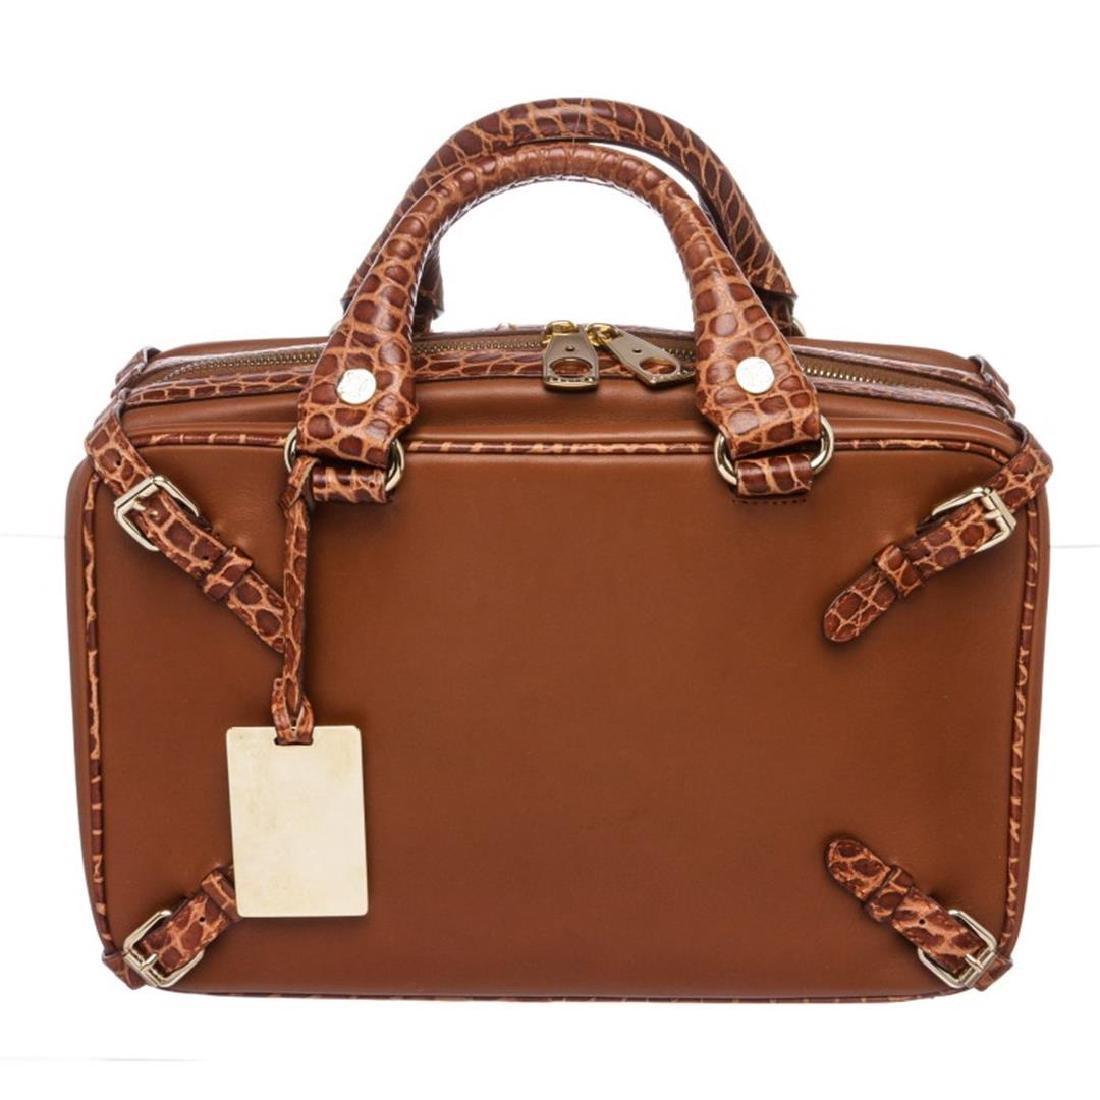 Celine Chocolate Brown Crocodile Embossed Leather